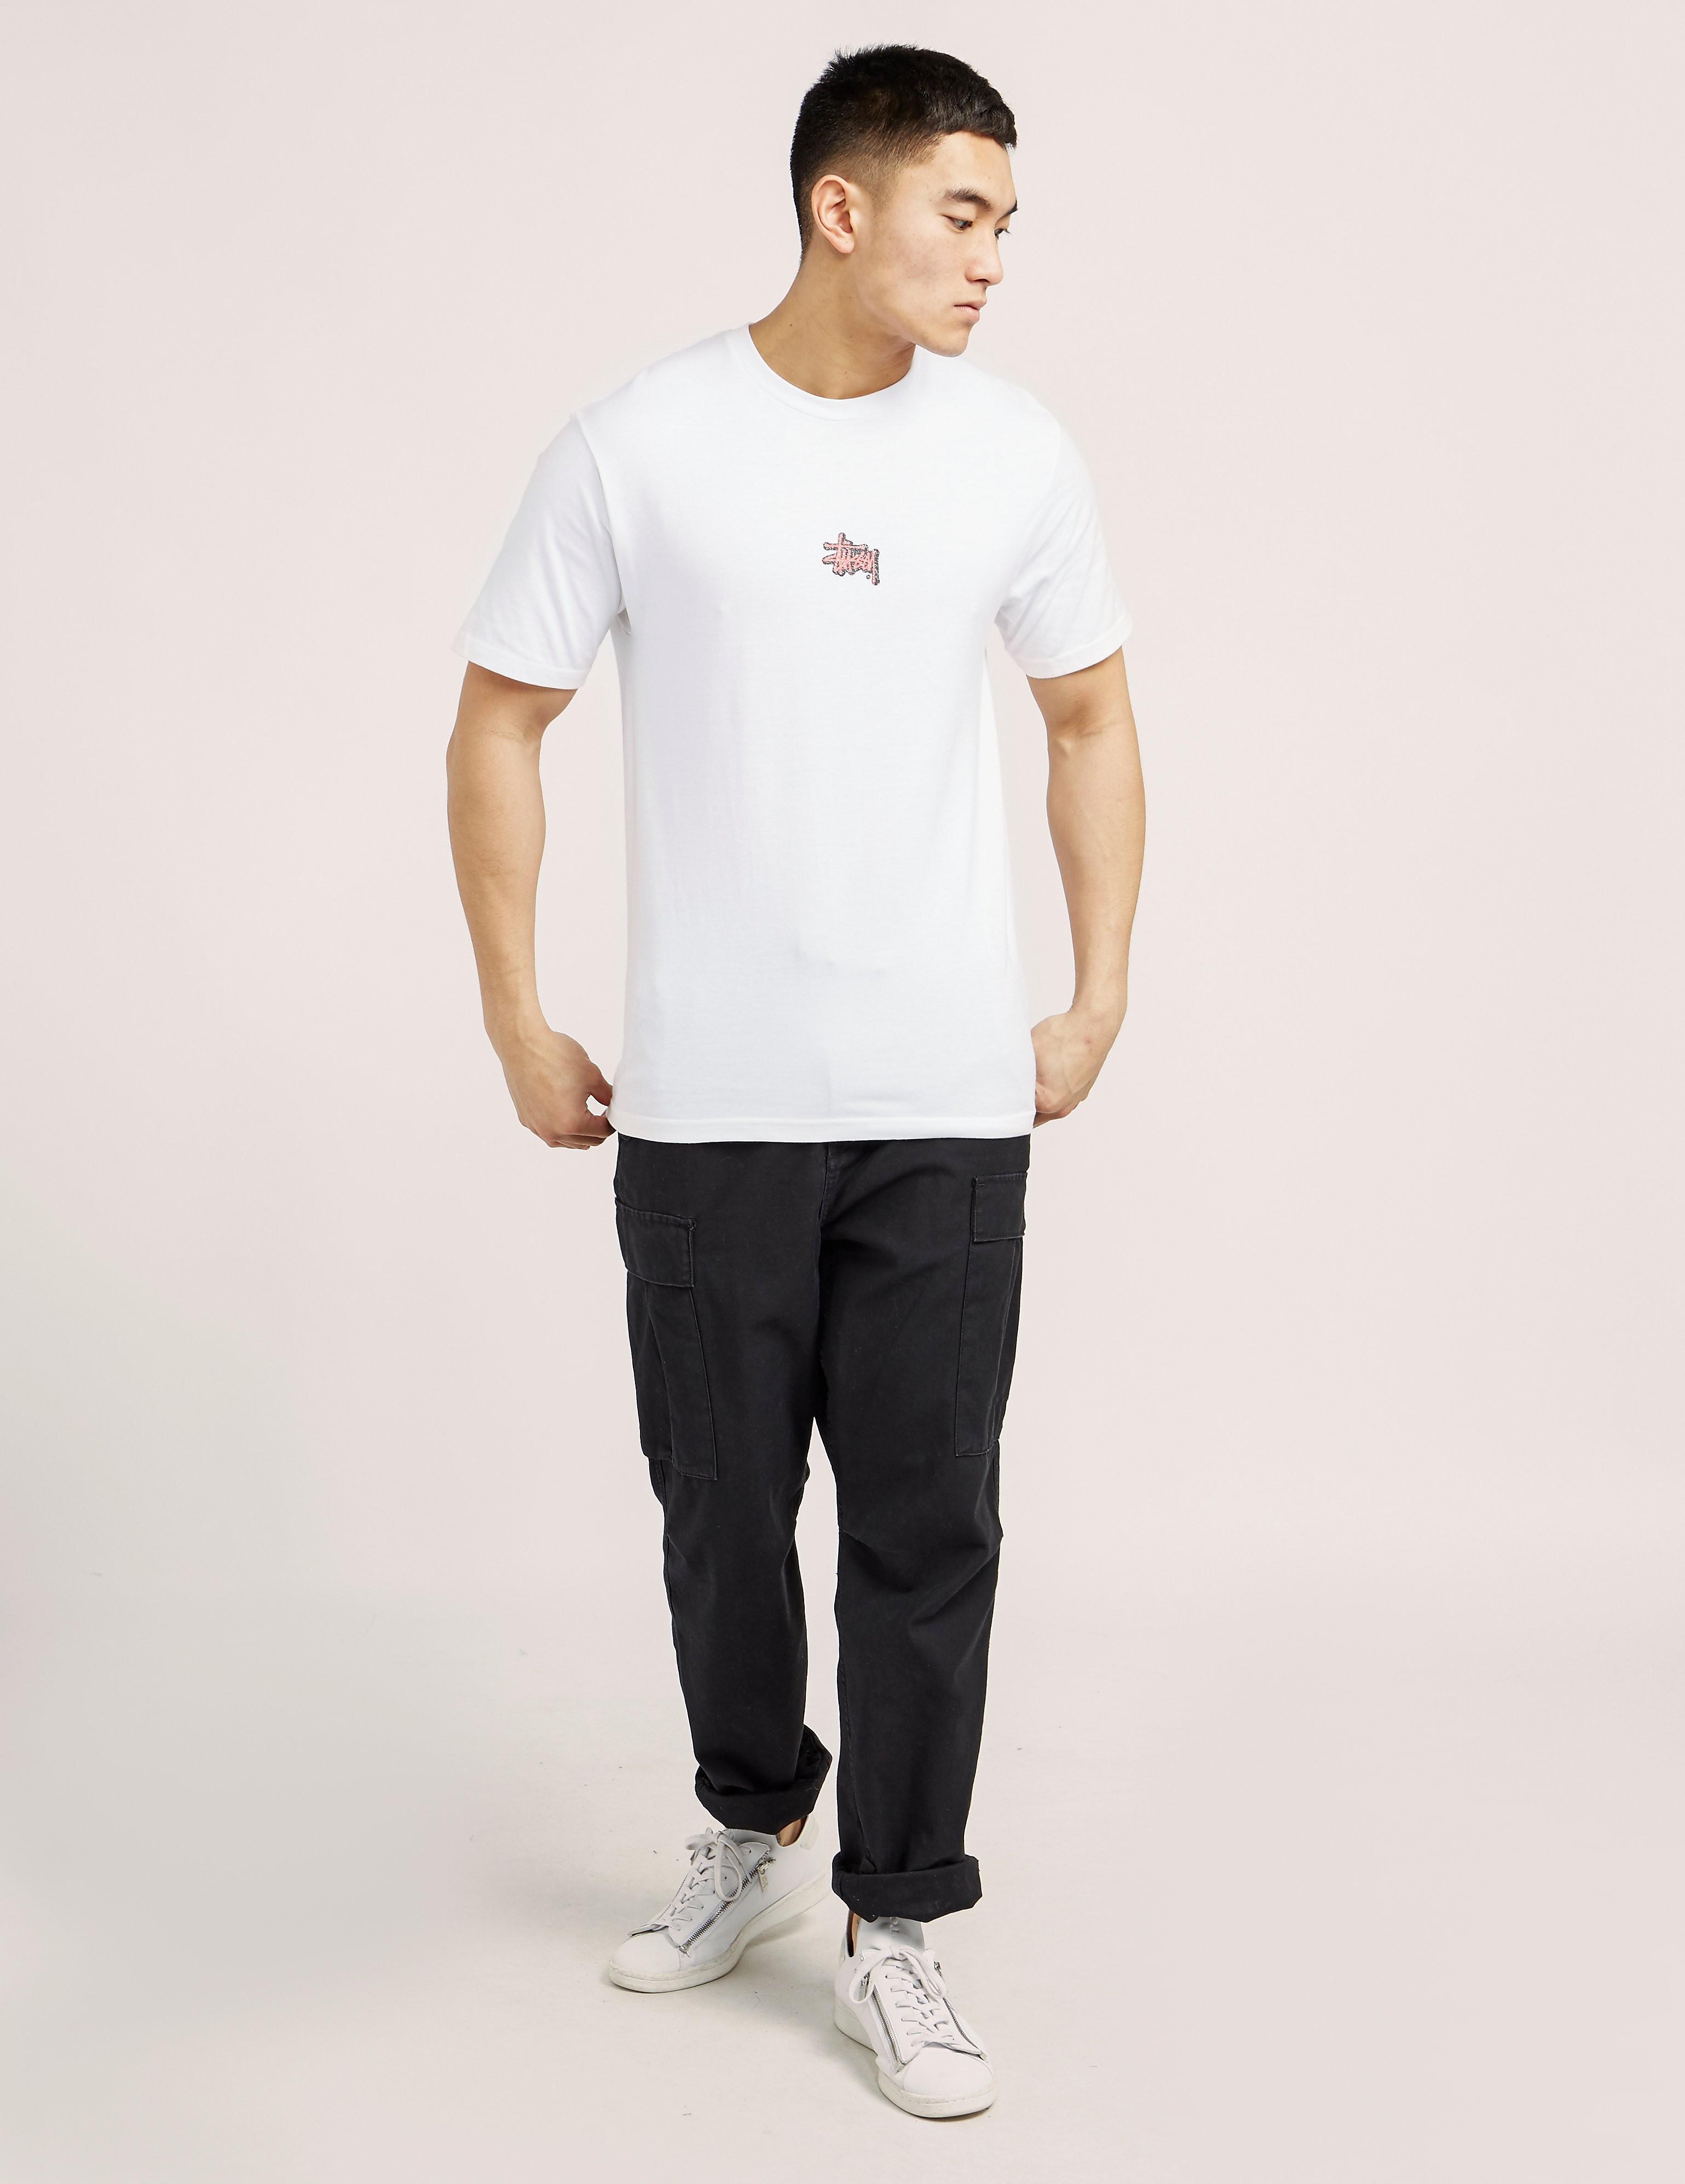 Stussy Lil Stu Short Sleeve T-Shirt